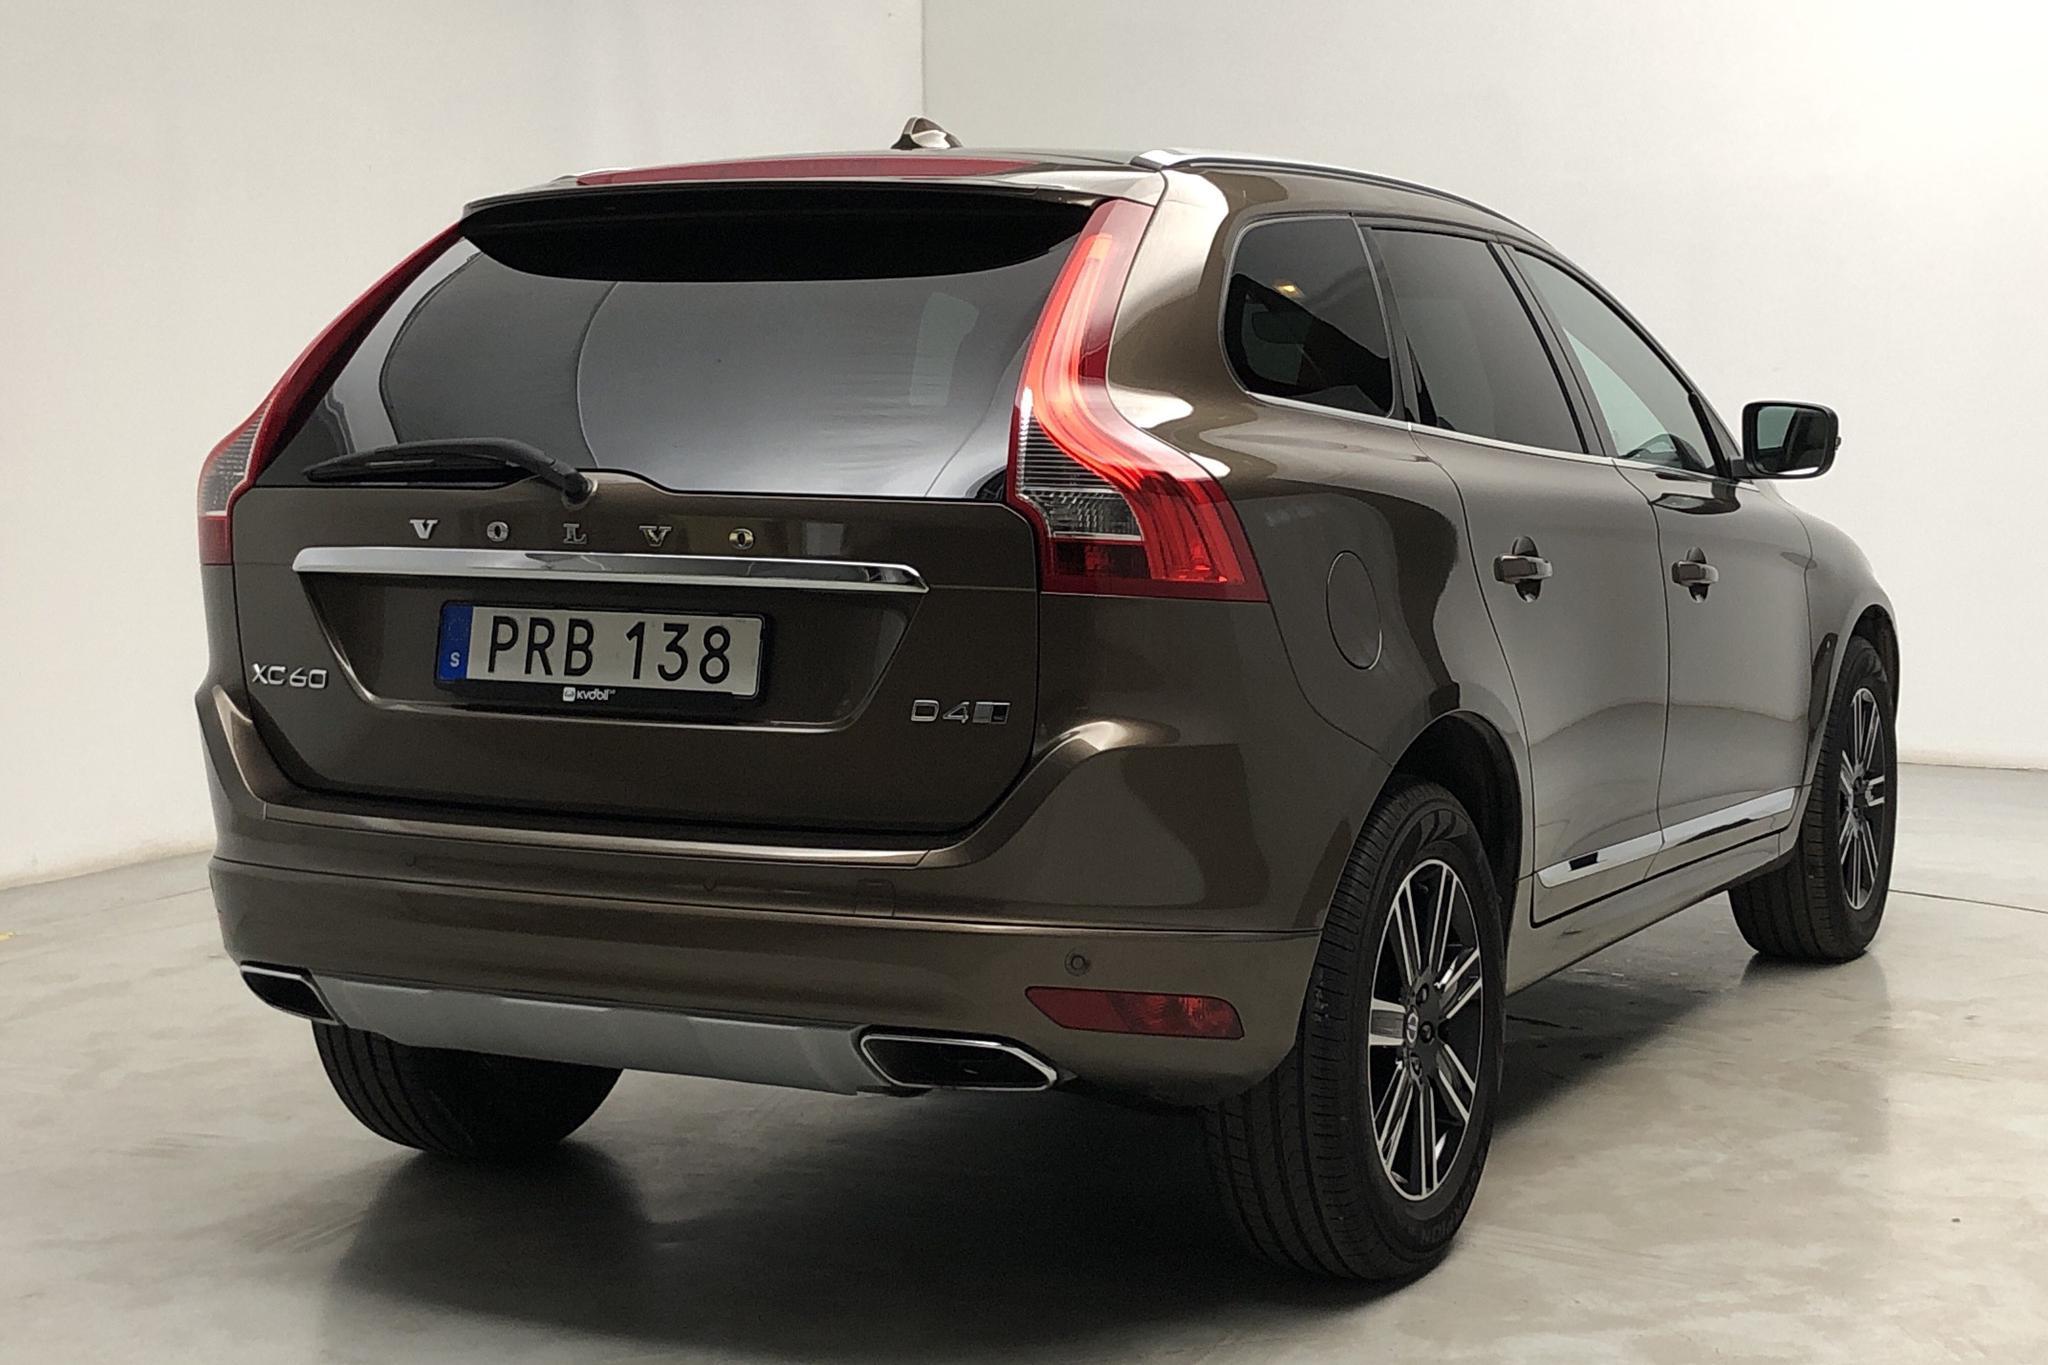 Volvo XC60 D4 AWD (190hk) - 104 080 km - Automatic - brown - 2017